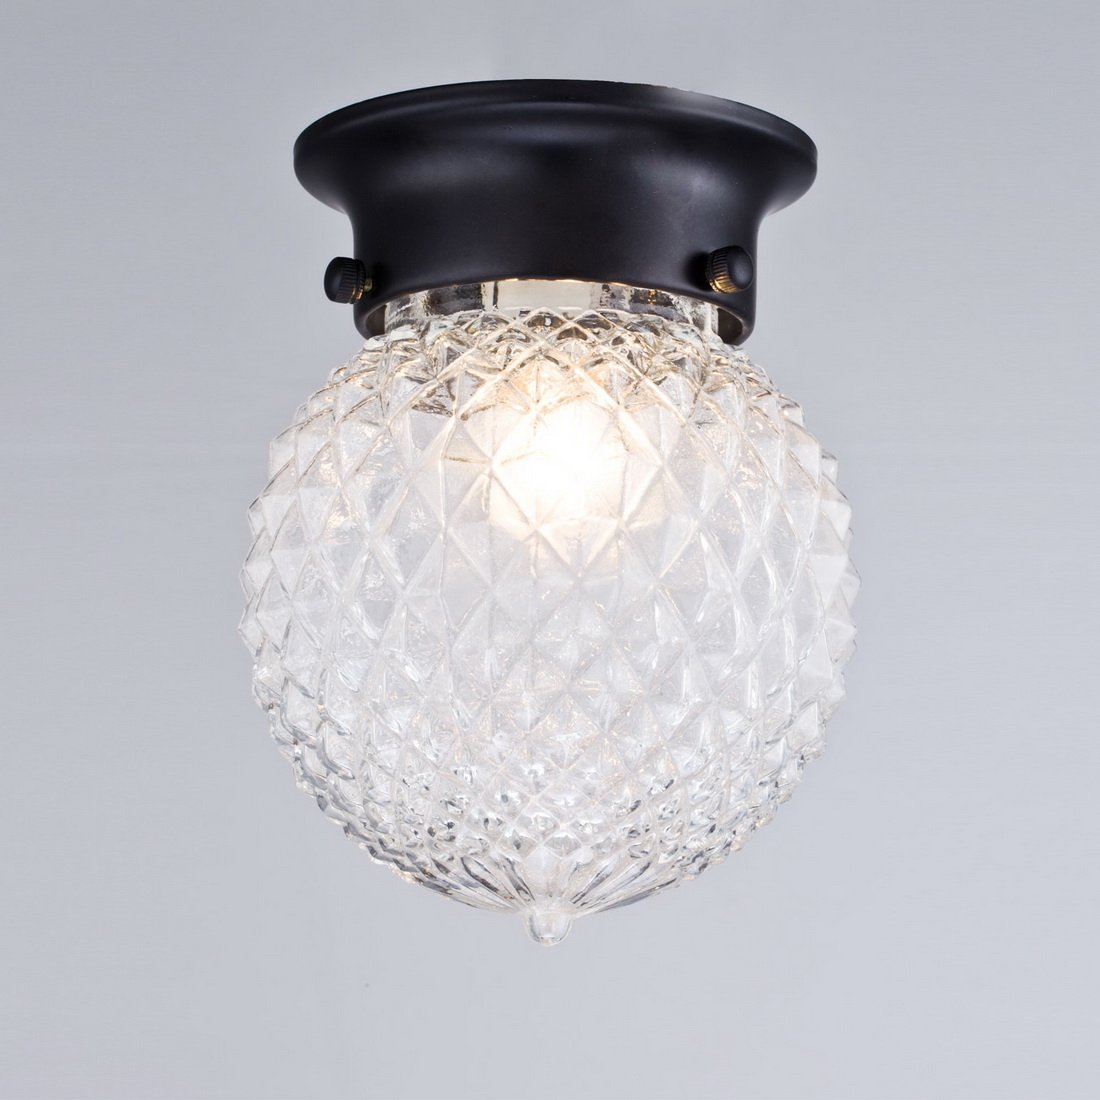 Flush Mount Ceiling Light Fixture Antique Glass Globe Clear Indoor Hallway Home